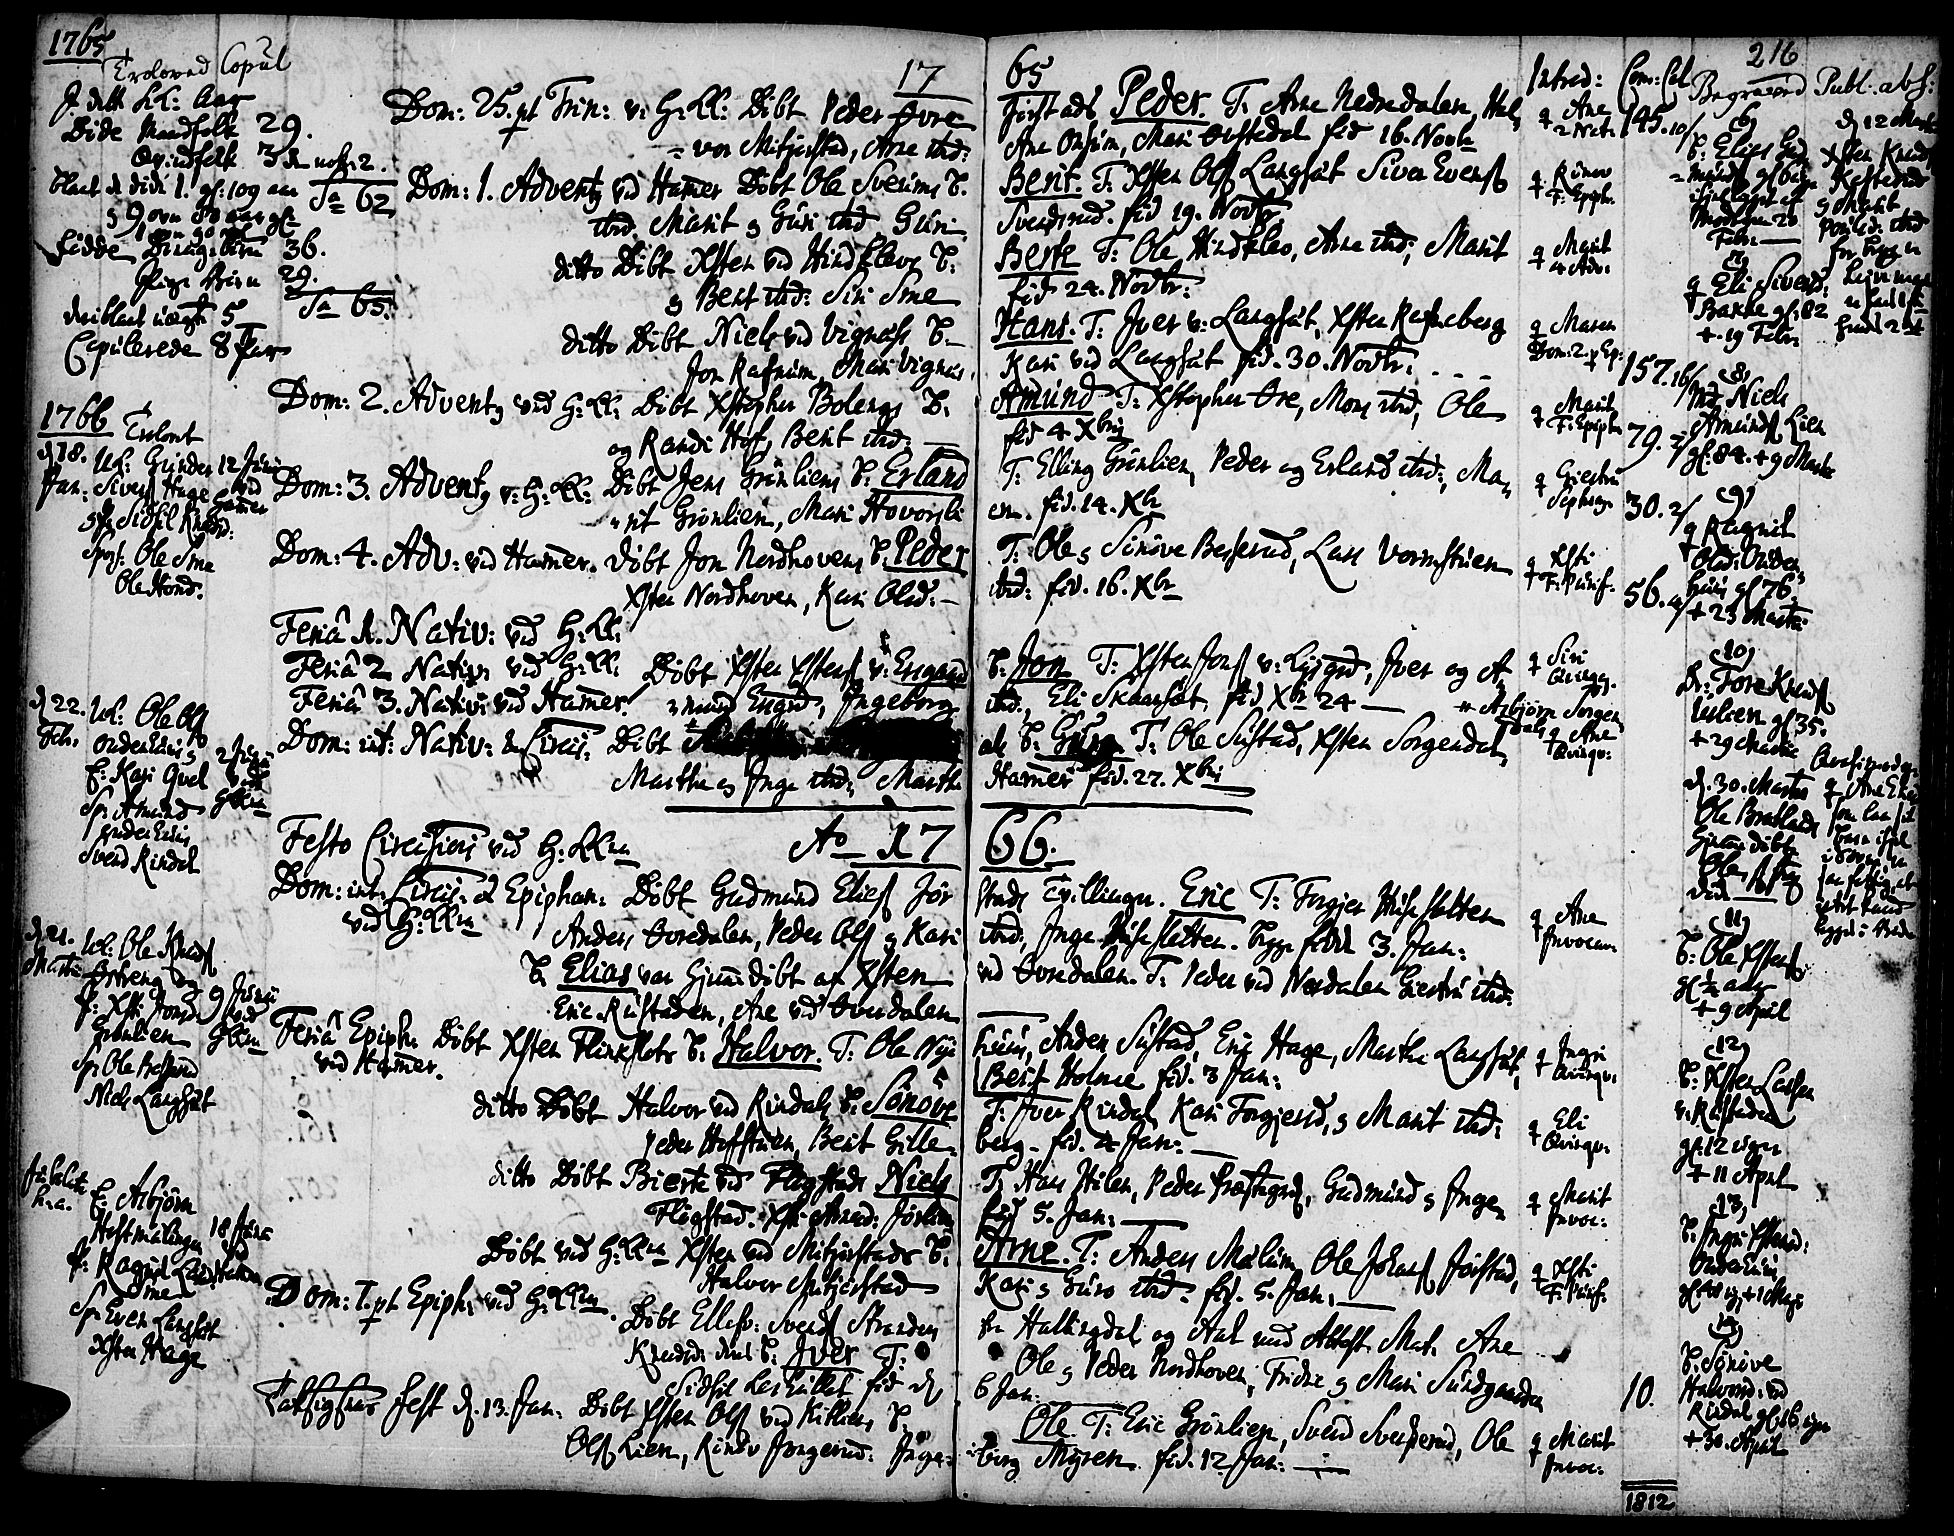 SAH, Fåberg prestekontor, Ministerialbok nr. 1, 1727-1775, s. 216